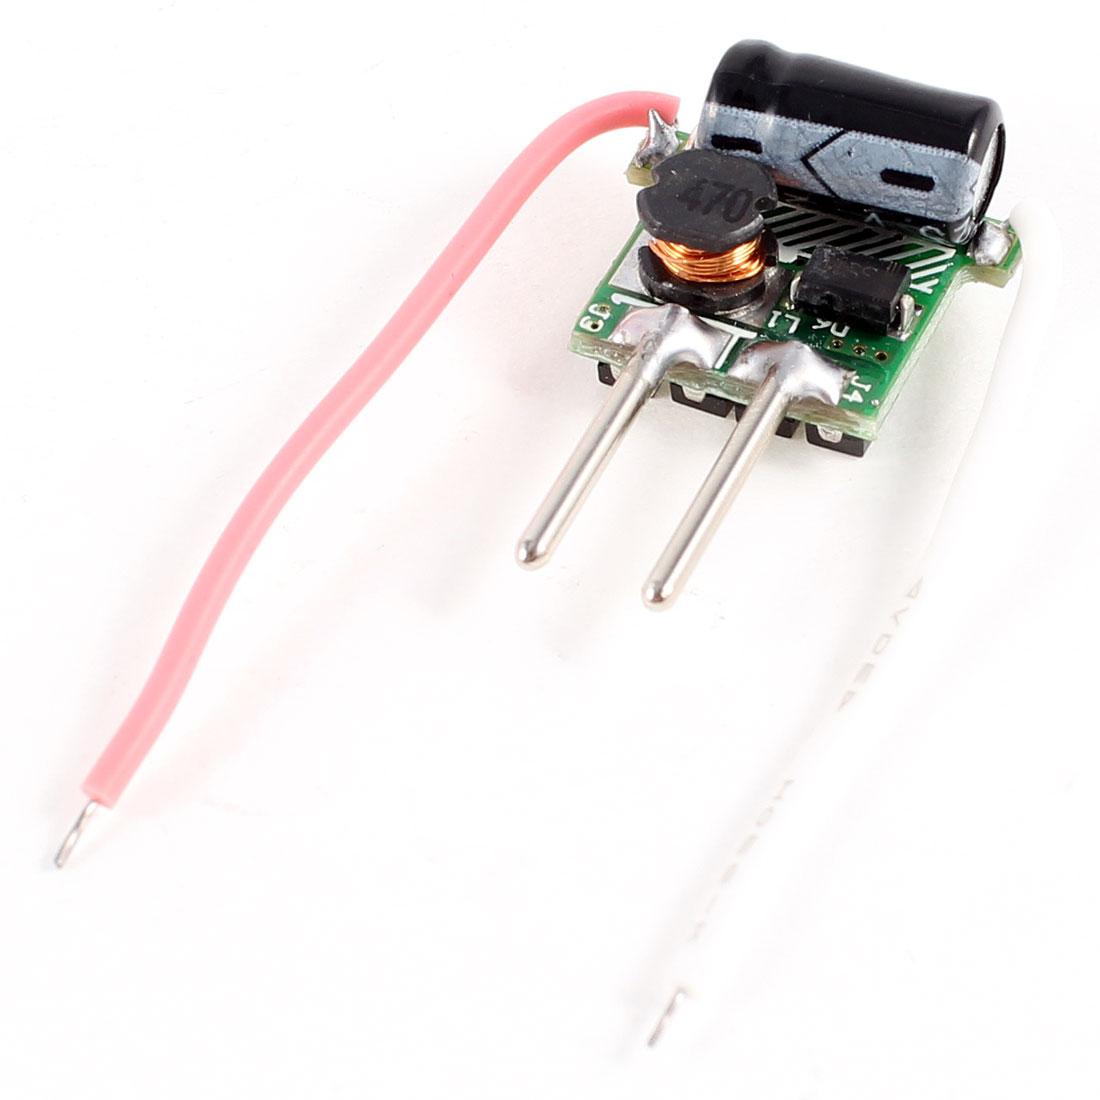 Power Supply Driver DC 12-24V for 3 x 1W LED Light Lamp